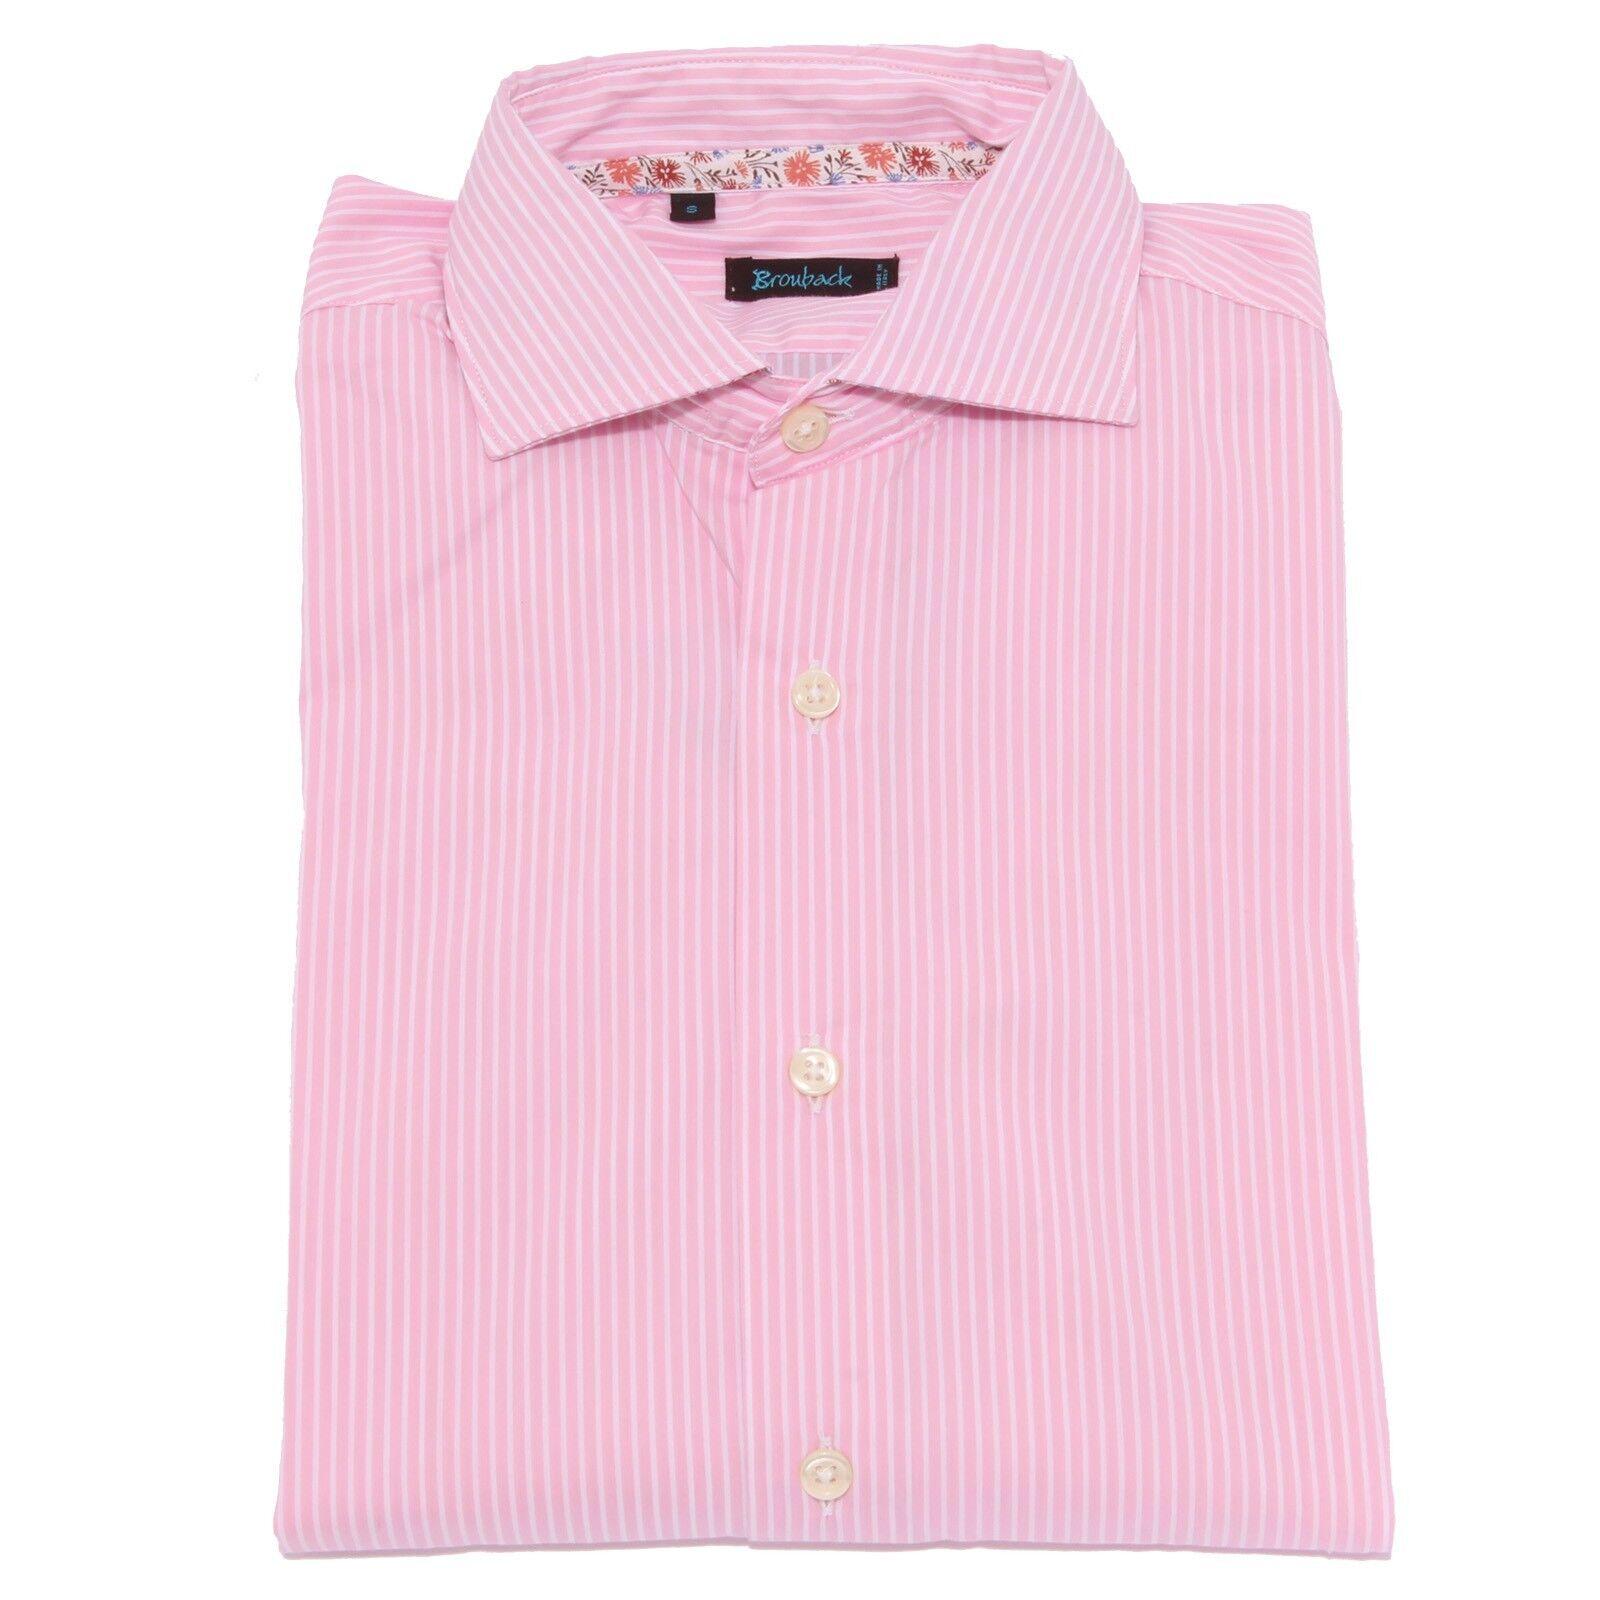 1577X camicia uomo BROUBACK LUXURY WASHED shirt stripes rosa bianca man